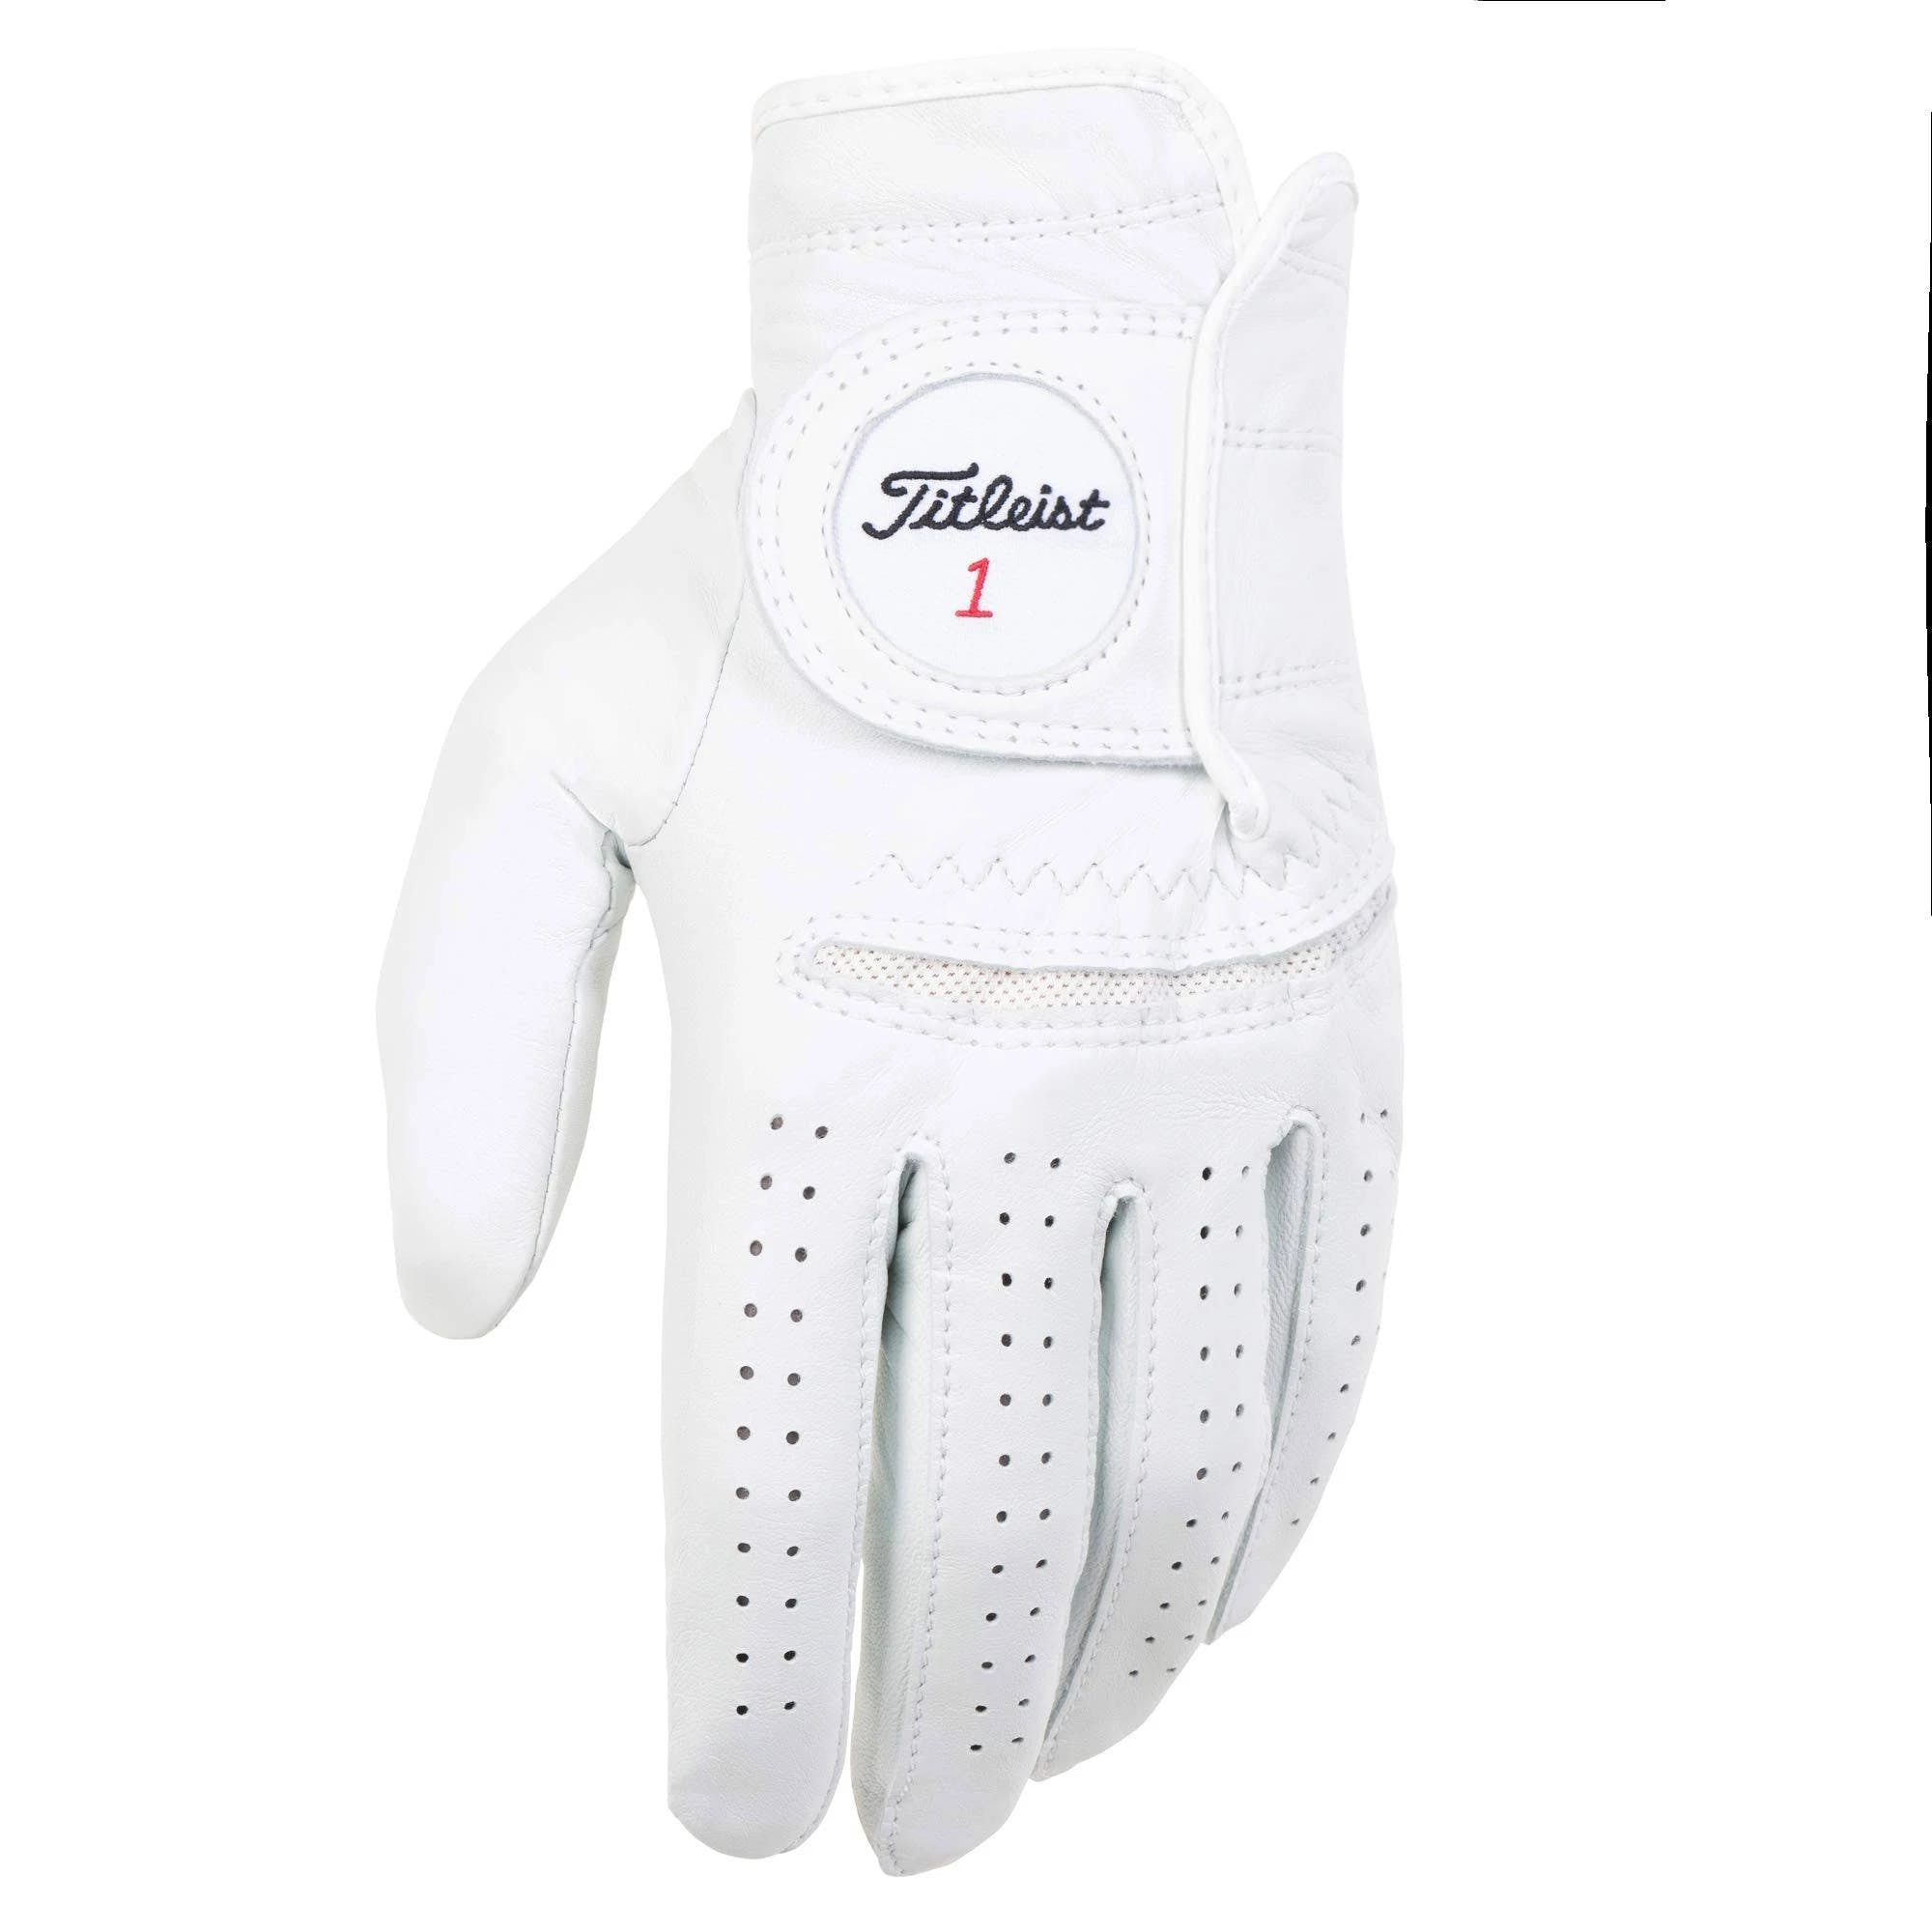 Titleist Perma-Soft Women's Golf Glove